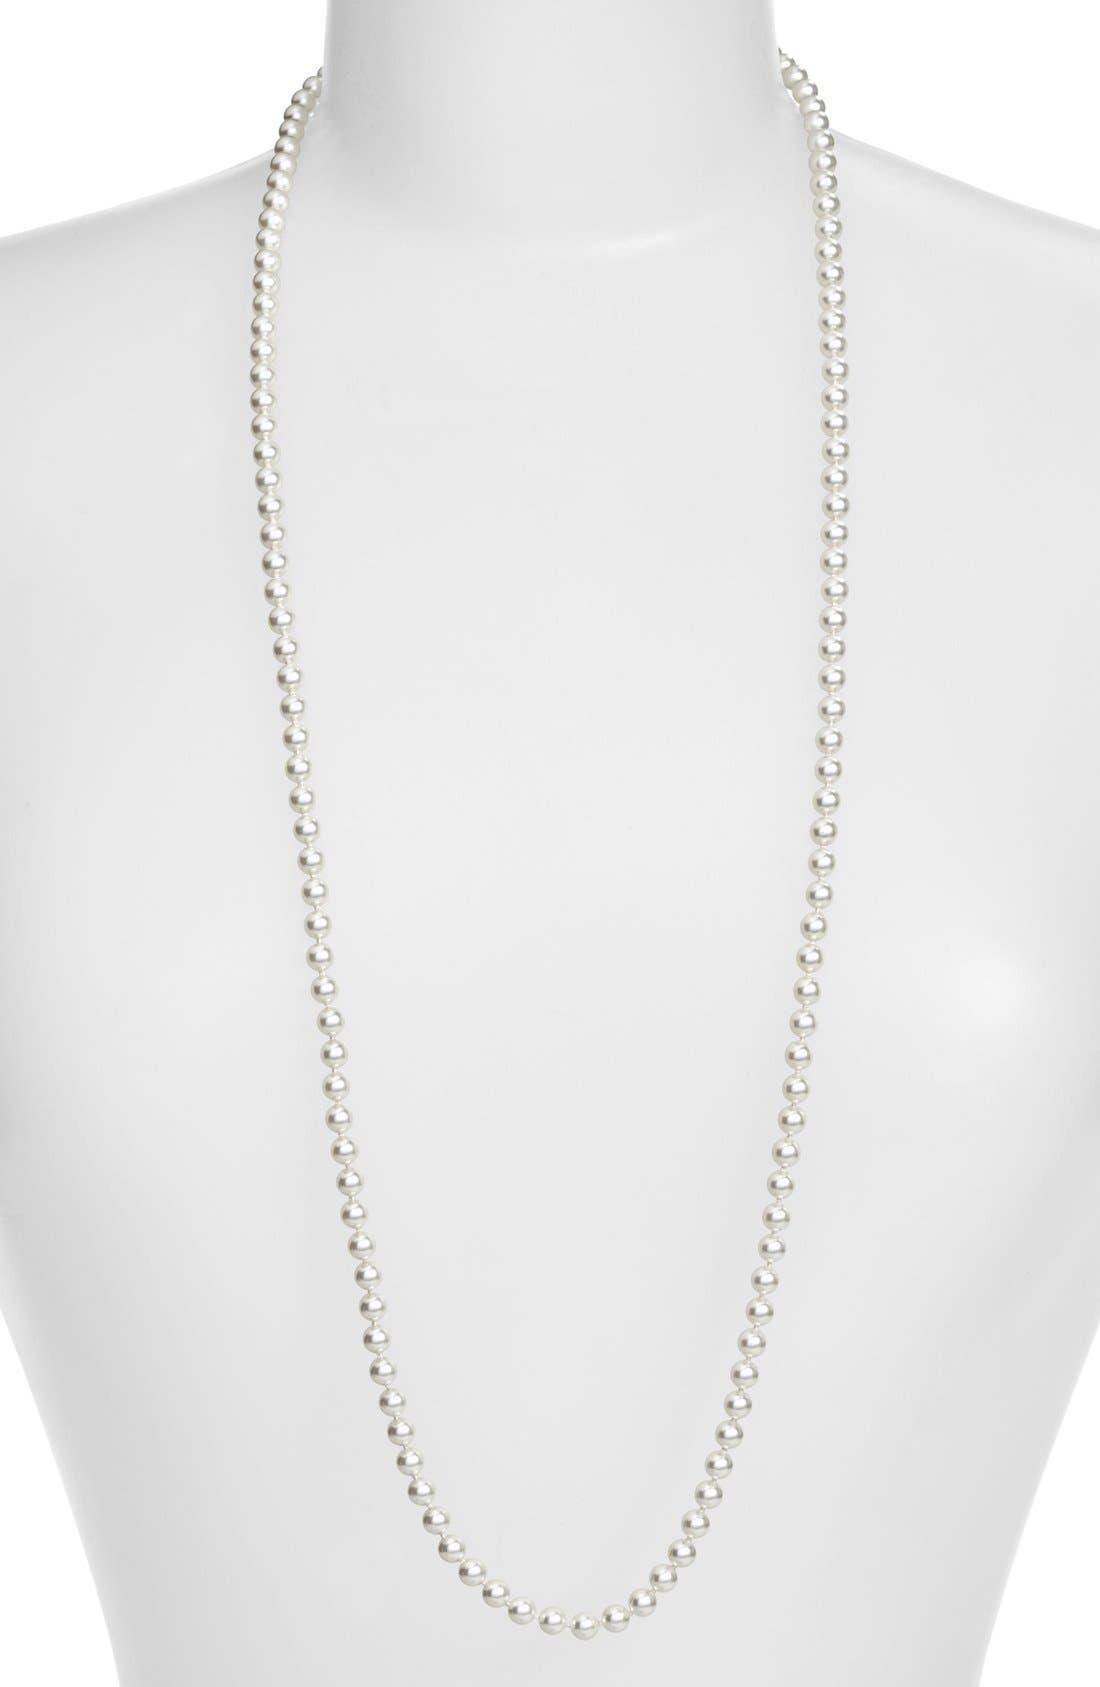 Main Image - NadriImitation Pearl Long Necklace